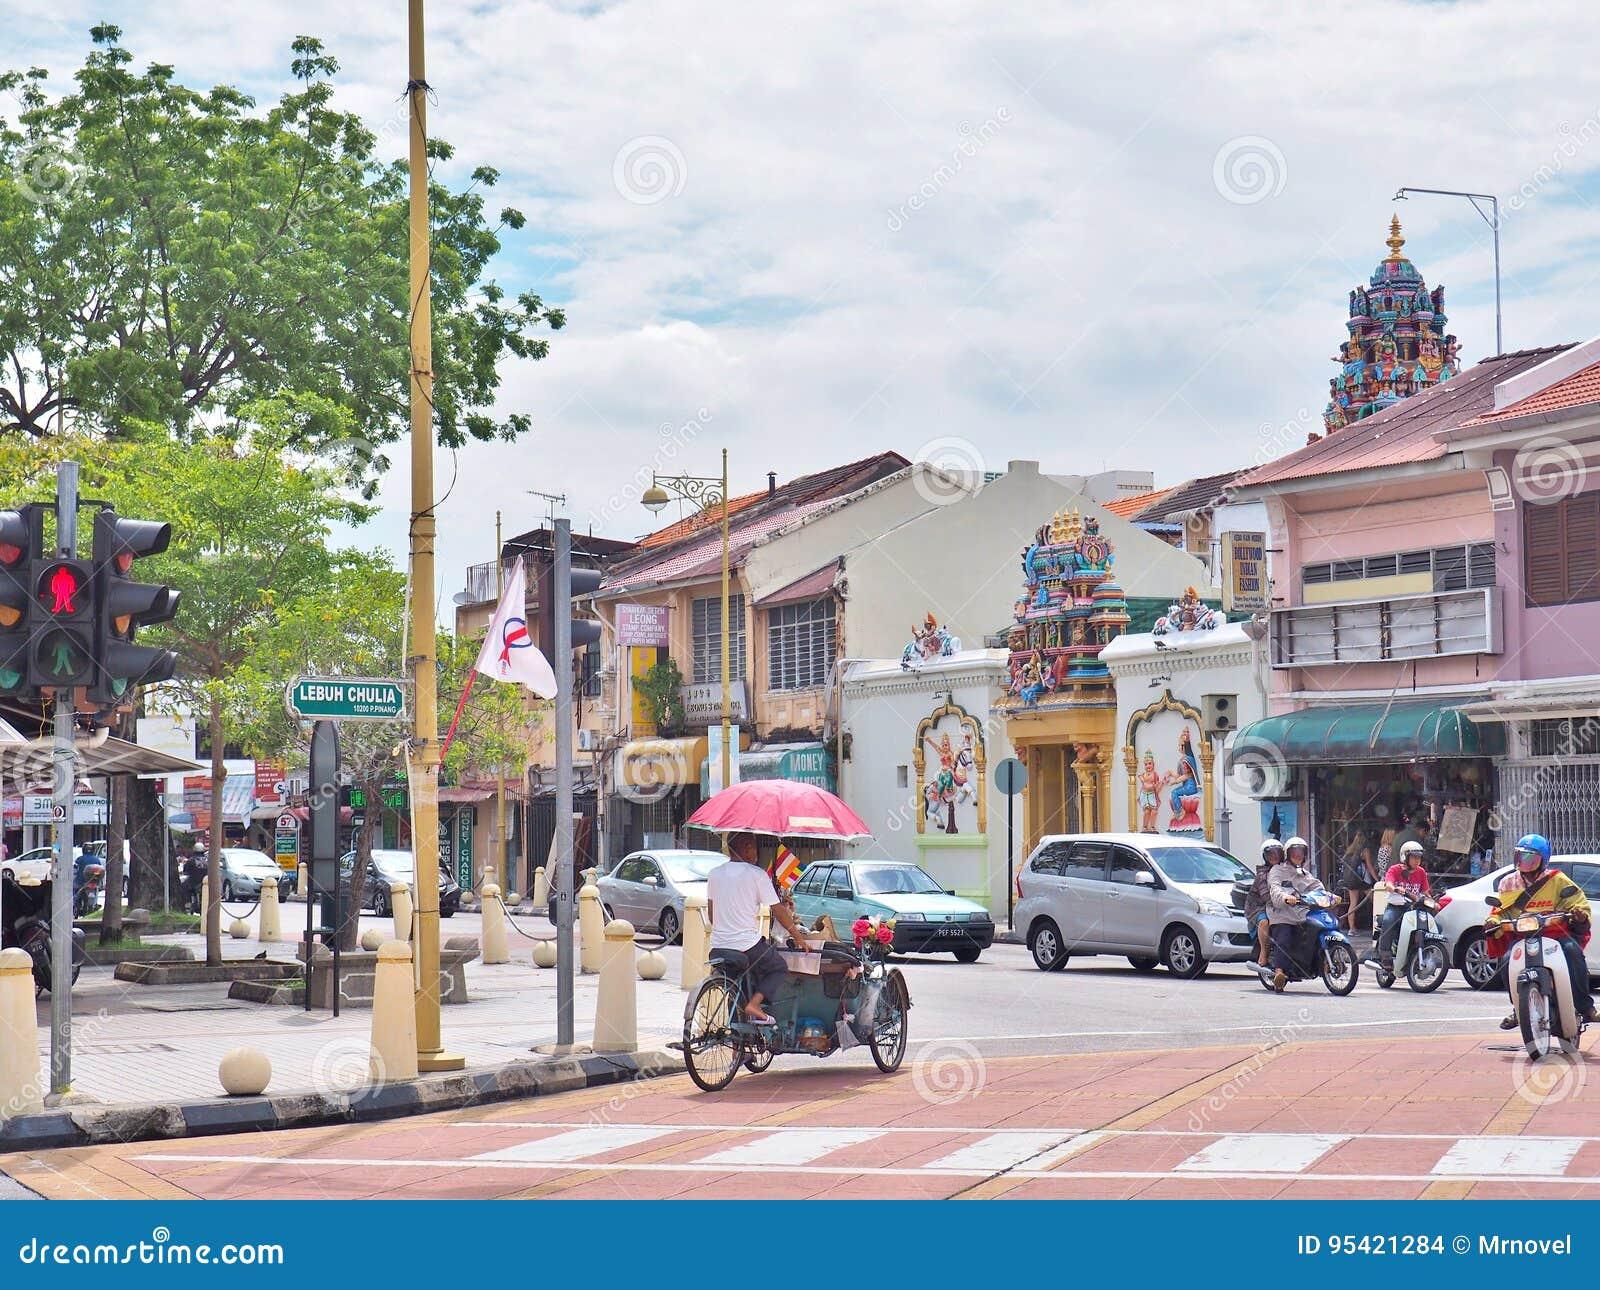 Trishaw bij de verbinding van Lebuh Chulia met Jalan Masjid Kapitan Keling vroeger Pitt Street in George Town